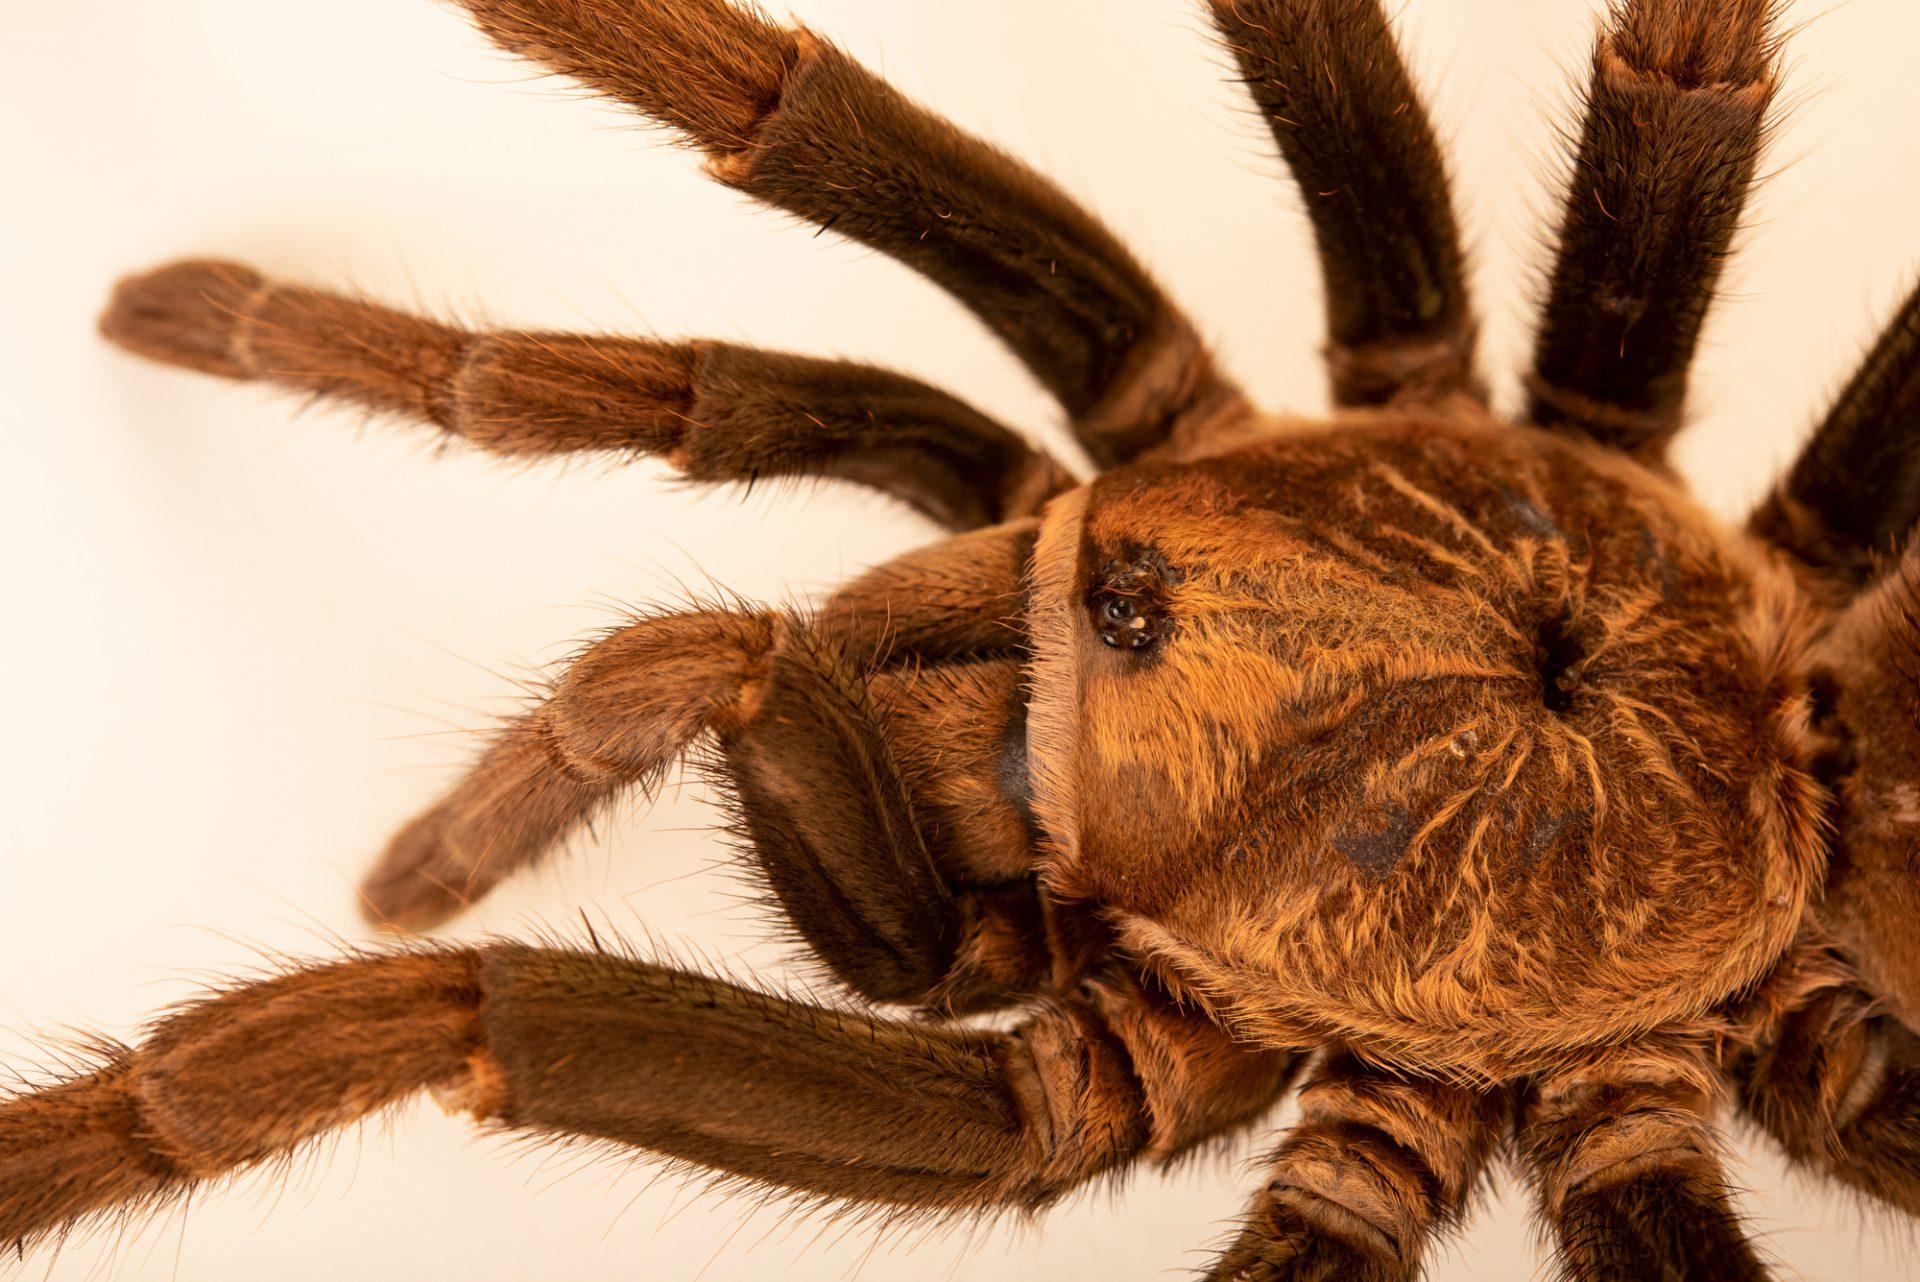 Photo: A Cuban bronze tarantula (Phormictopus auratus) at Museum of Nature South Tyrol.